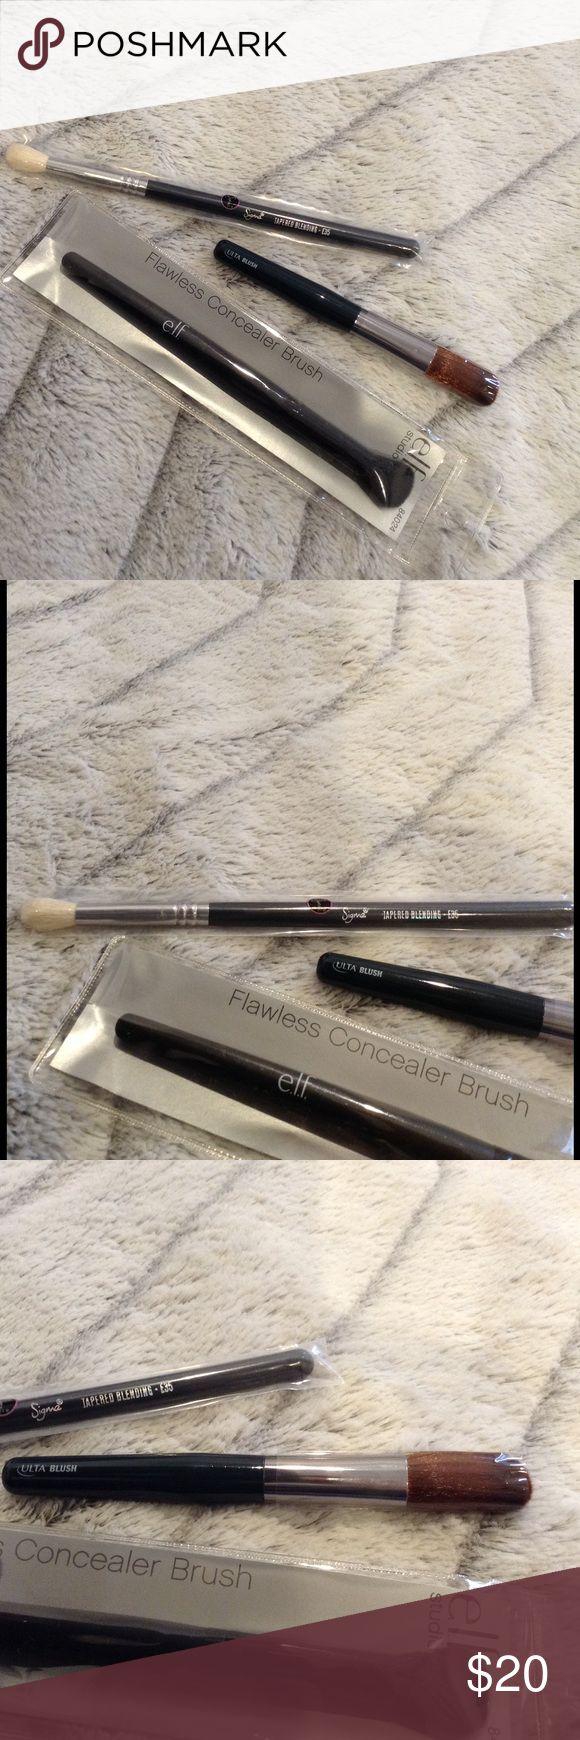 Sigma makeup brush +extras Brand new brushes. sigma Makeup Brushes & Tools